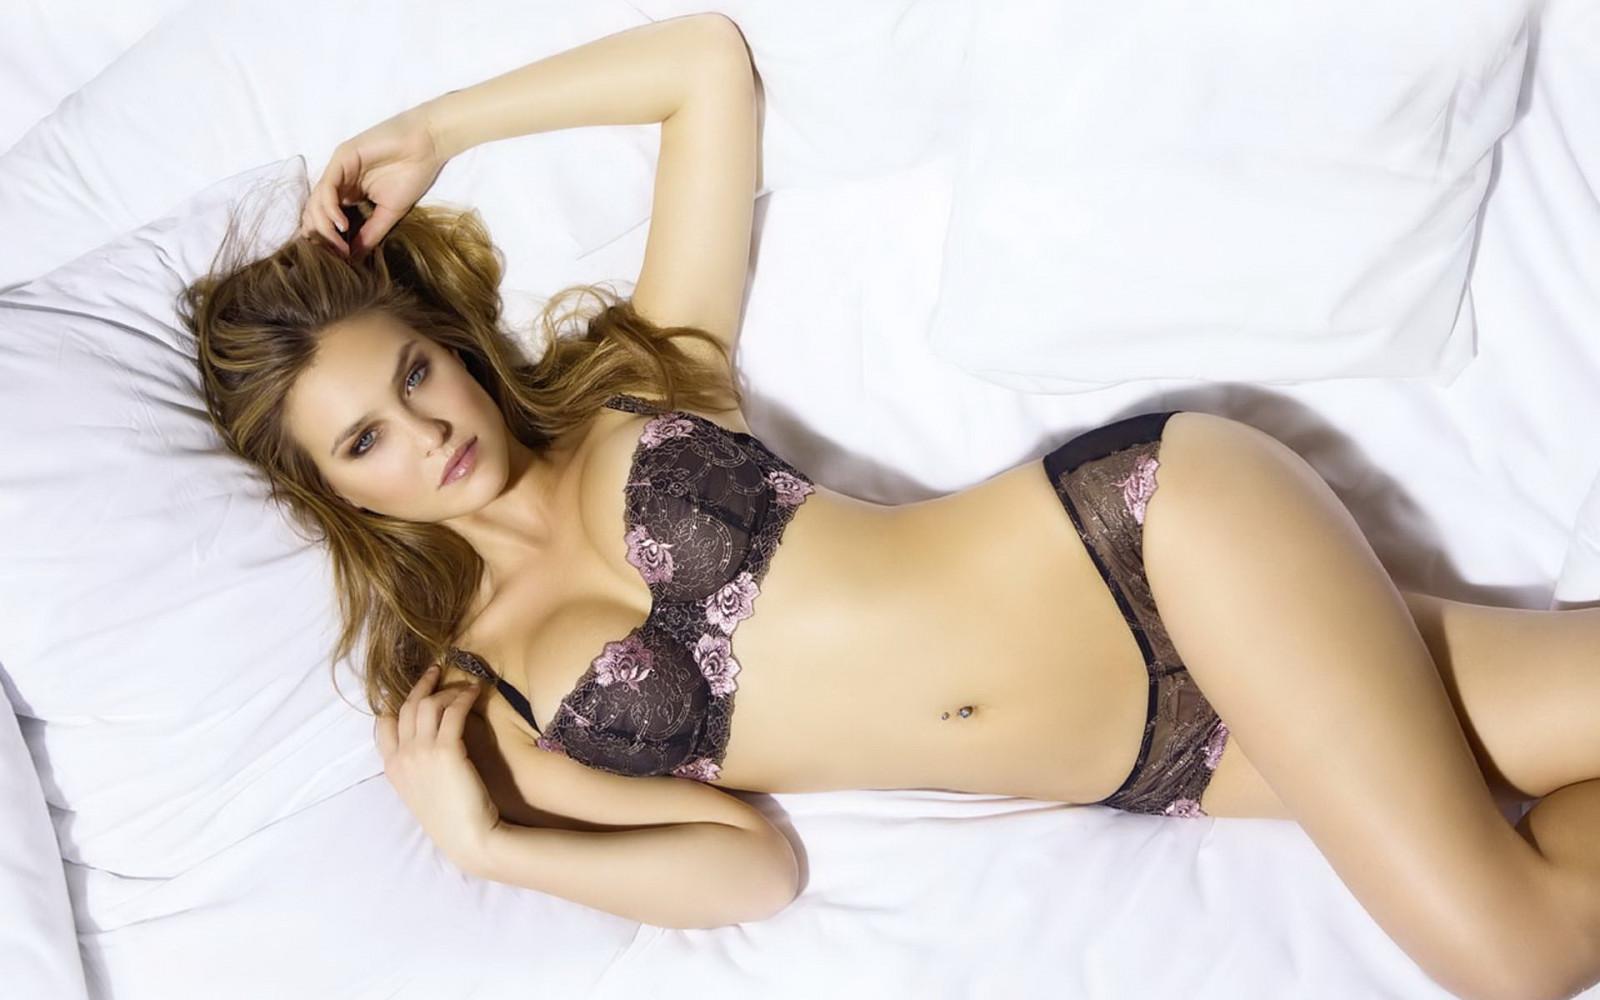 Sexy model free — photo 11